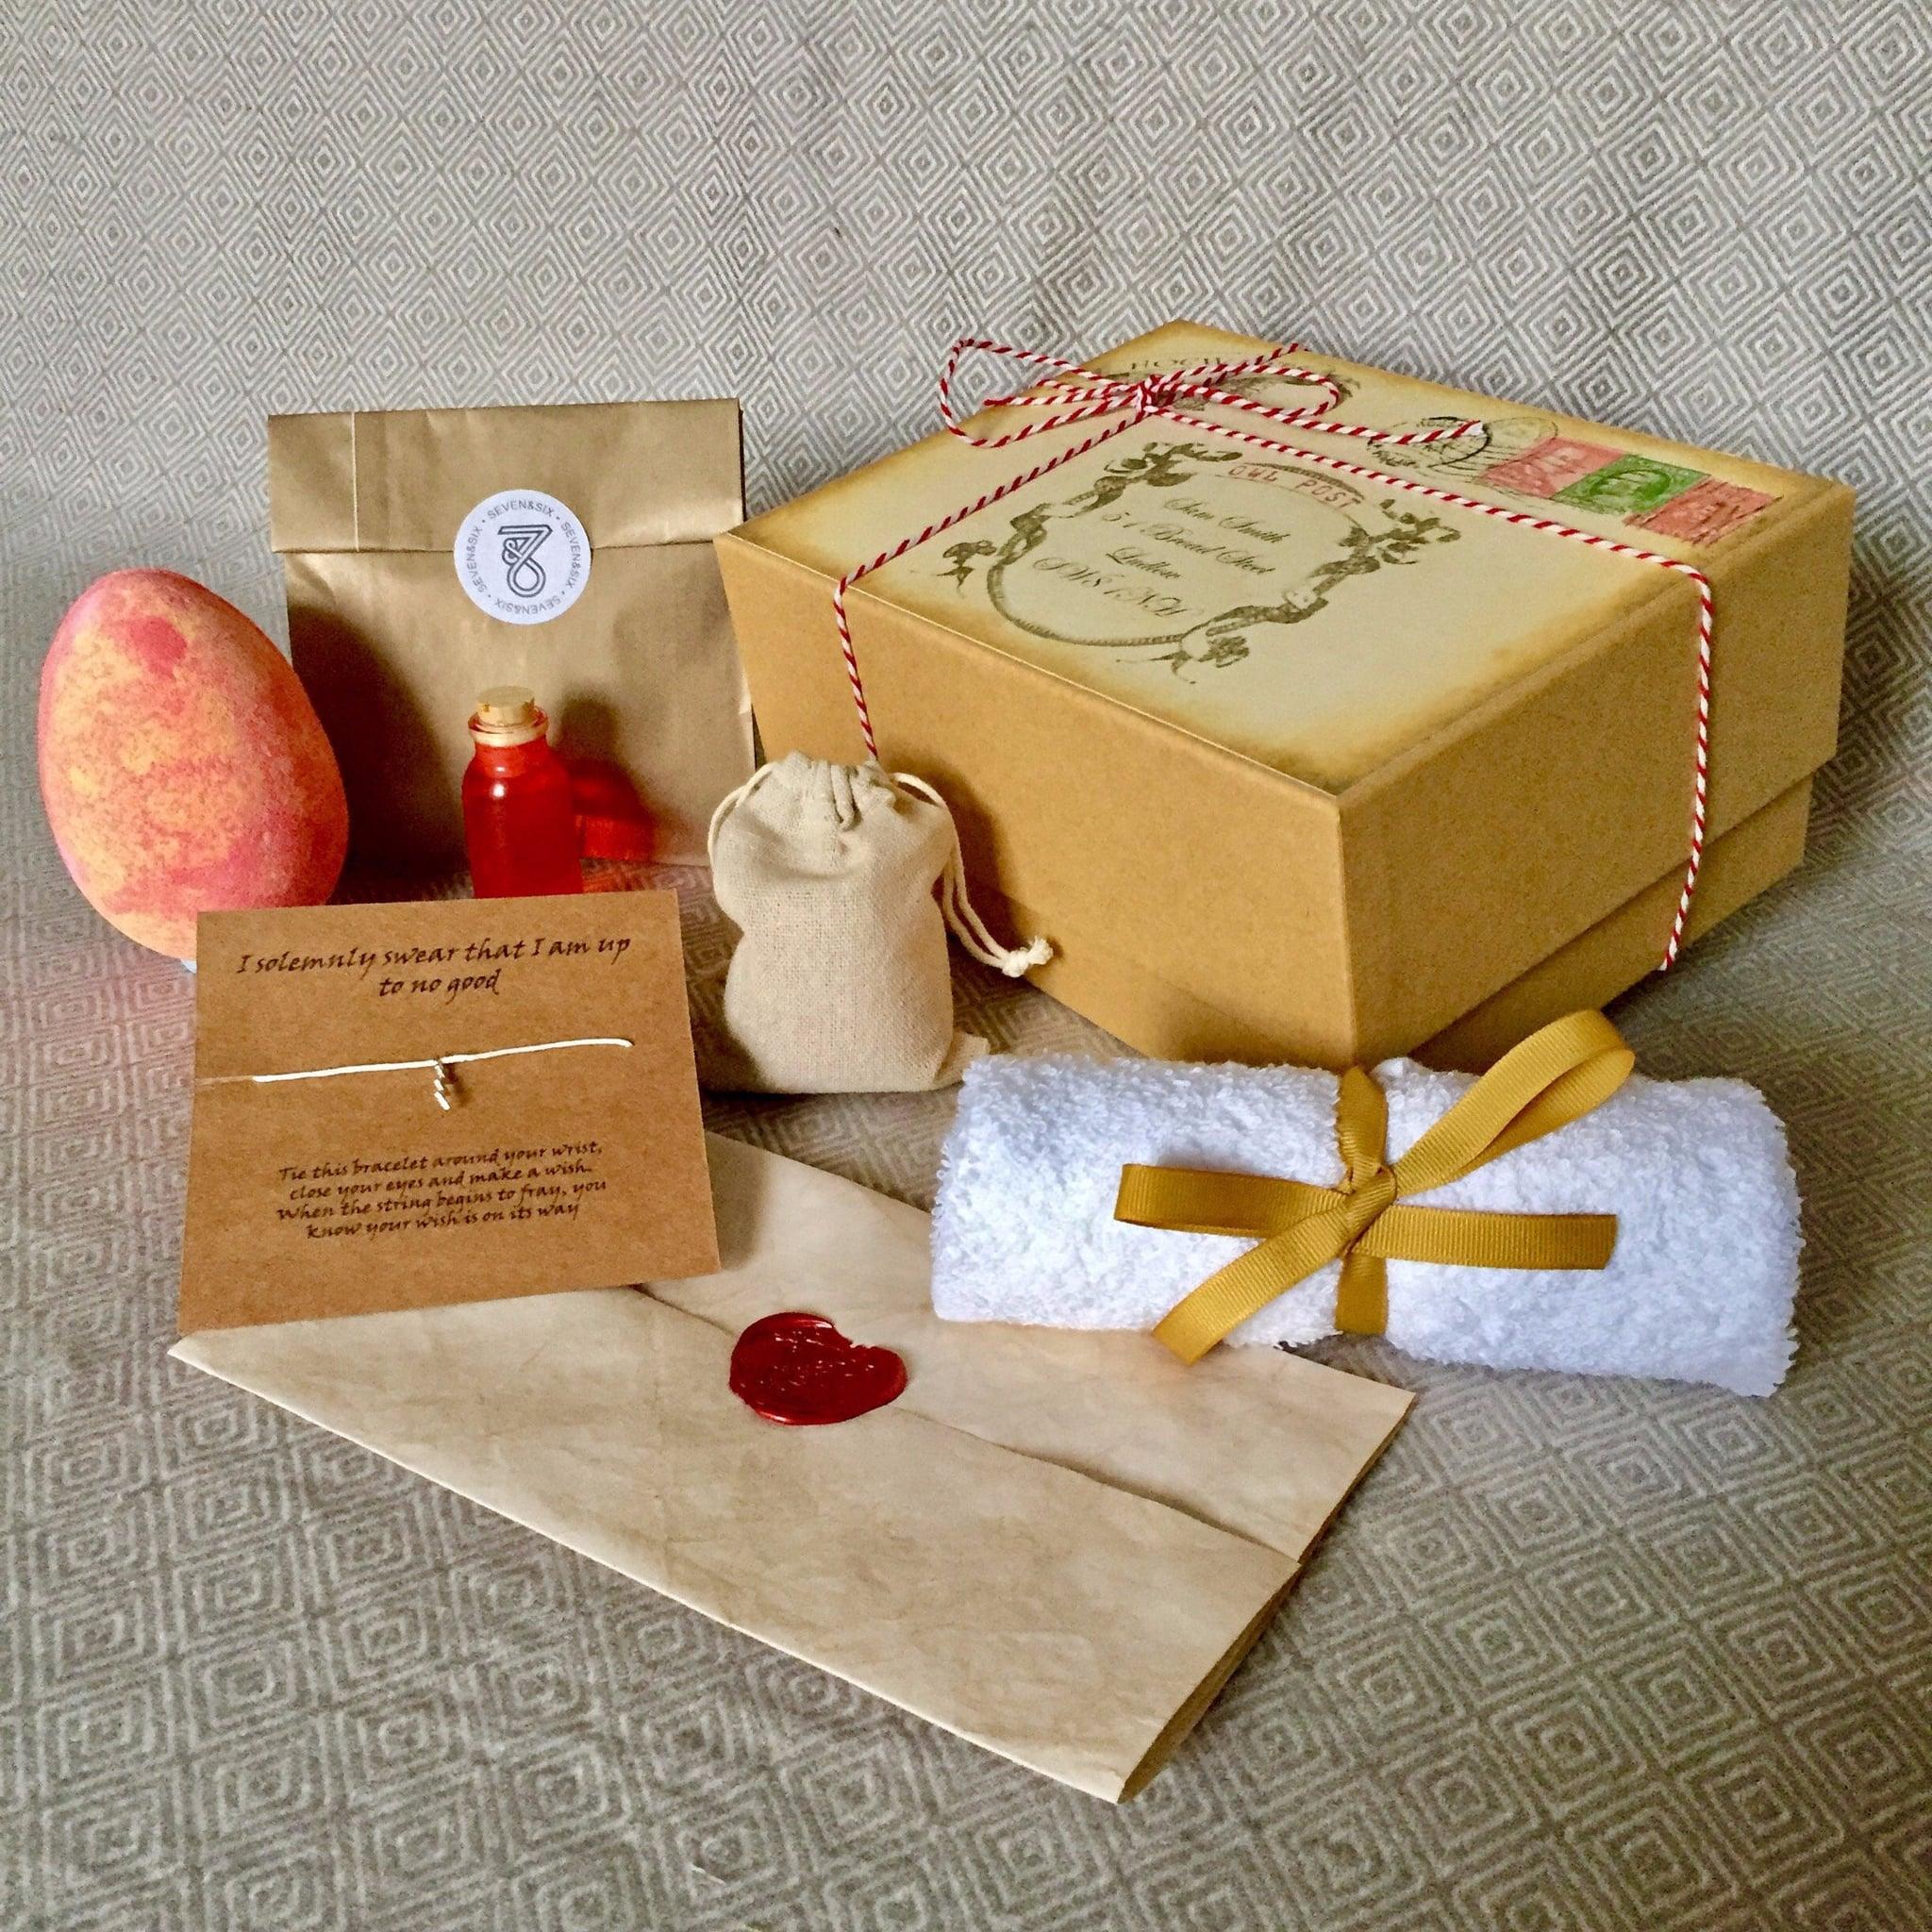 Harry Potter Bath Bomb Holiday Gift Set 2017 | POPSUGAR Beauty